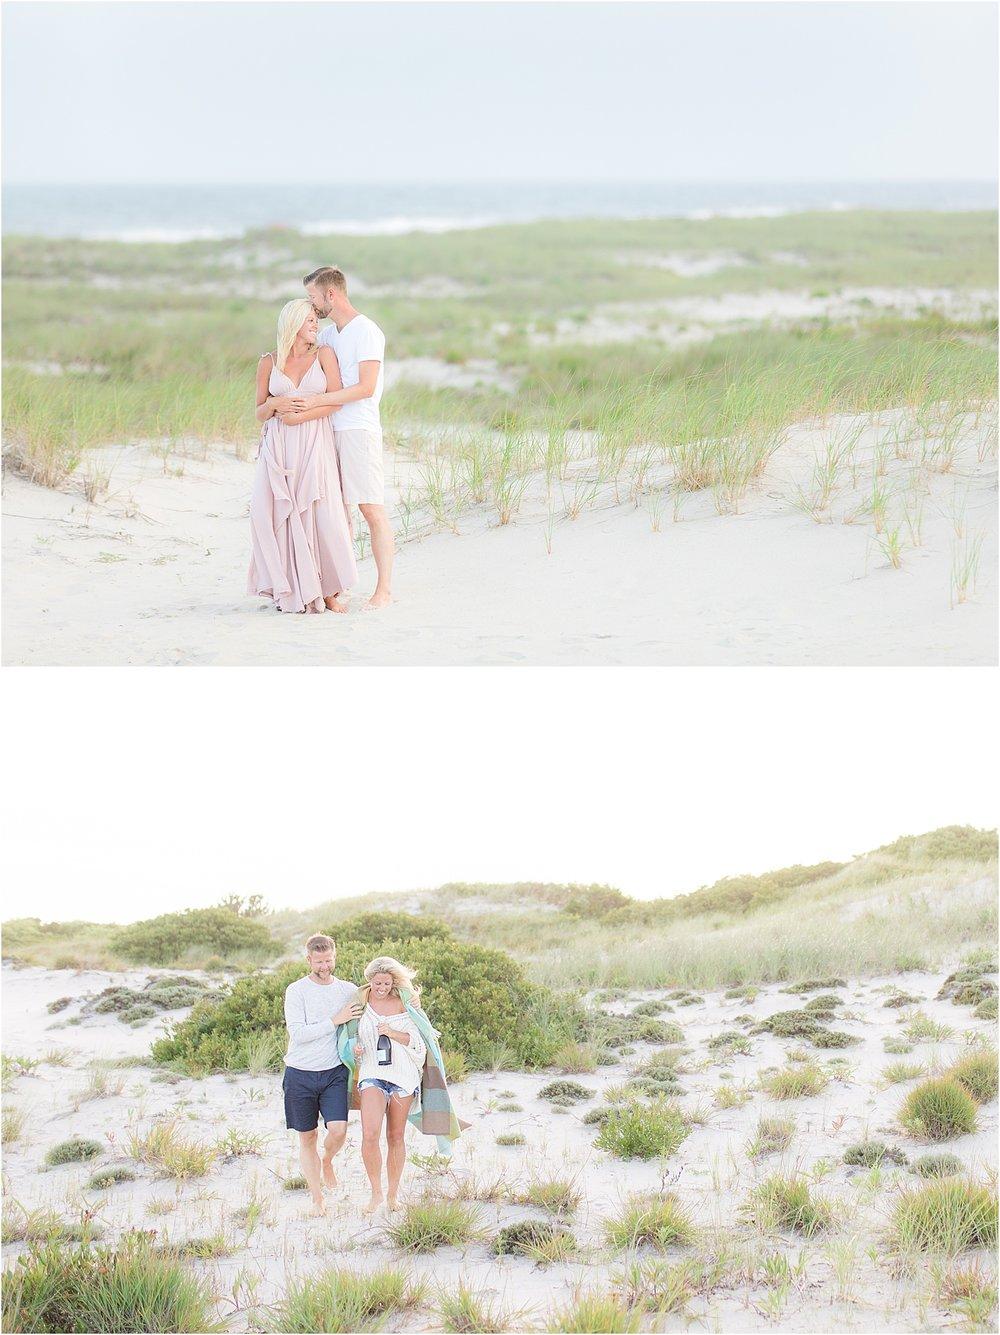 romantic engagement photos on the beach in LBI NJ